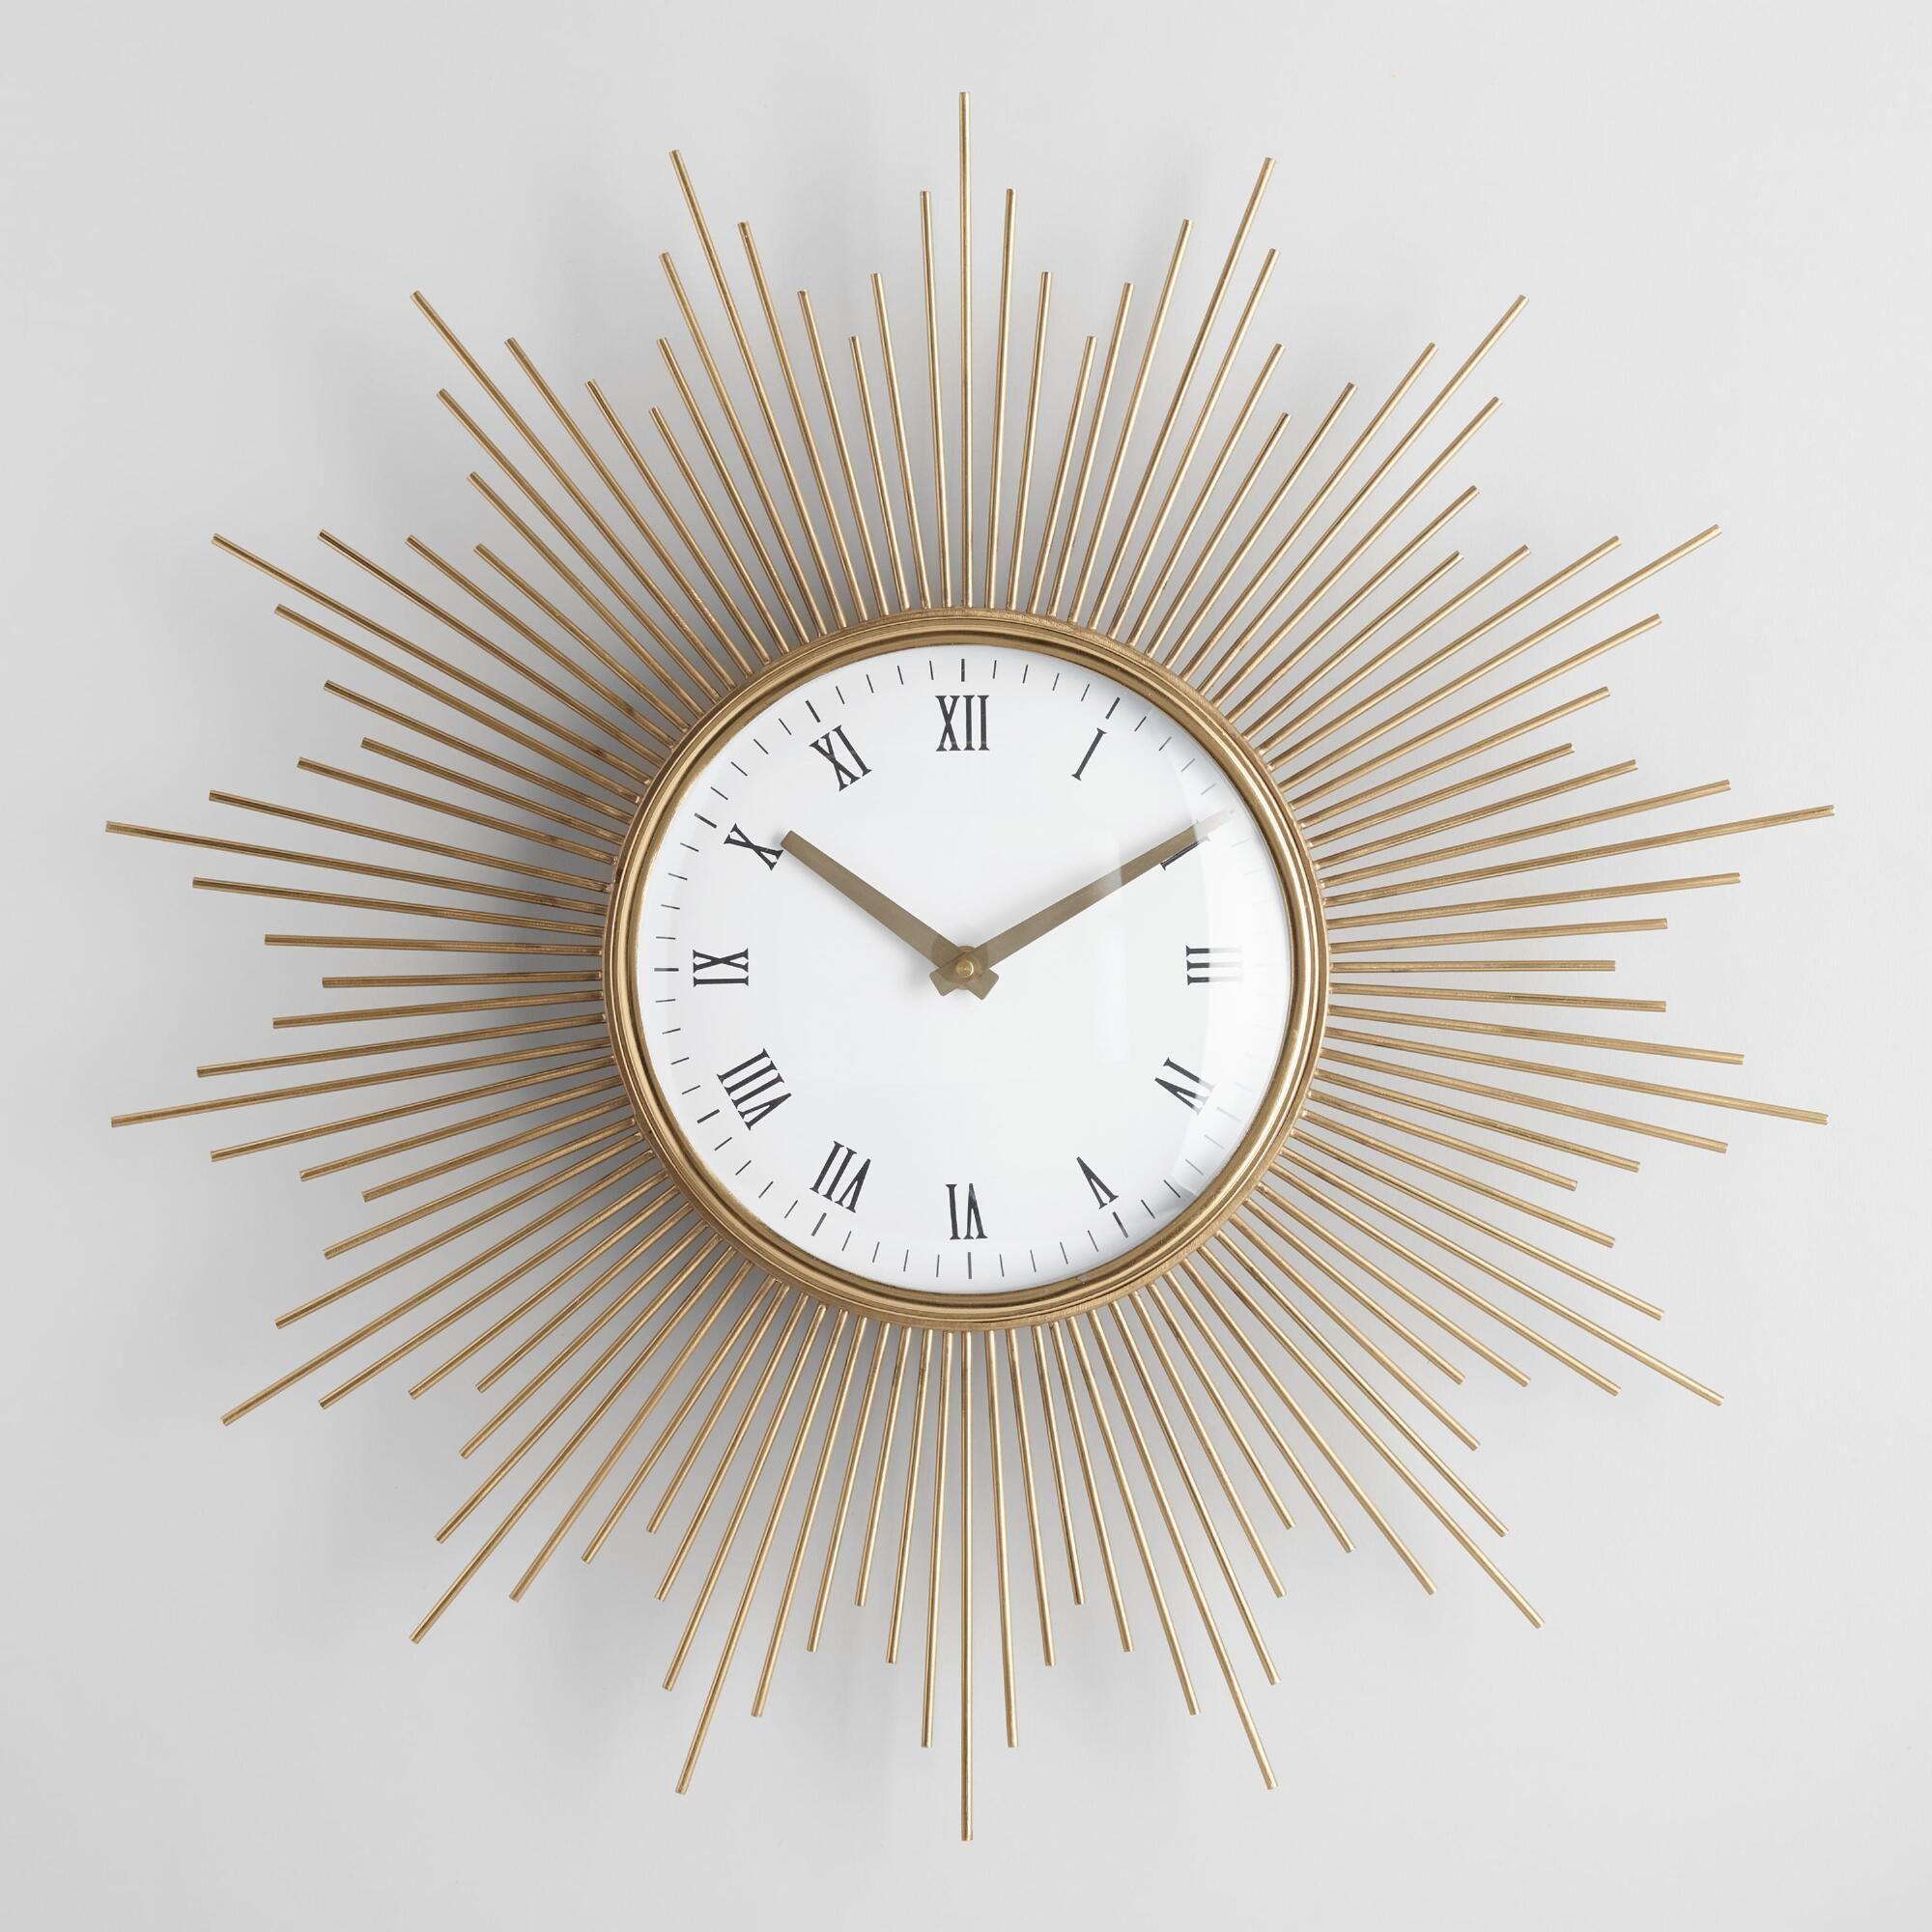 Round Mid Century Spoke Wall Clock By World Market Wanduhr Wanduhr Dekoration Silberne Wanduhr